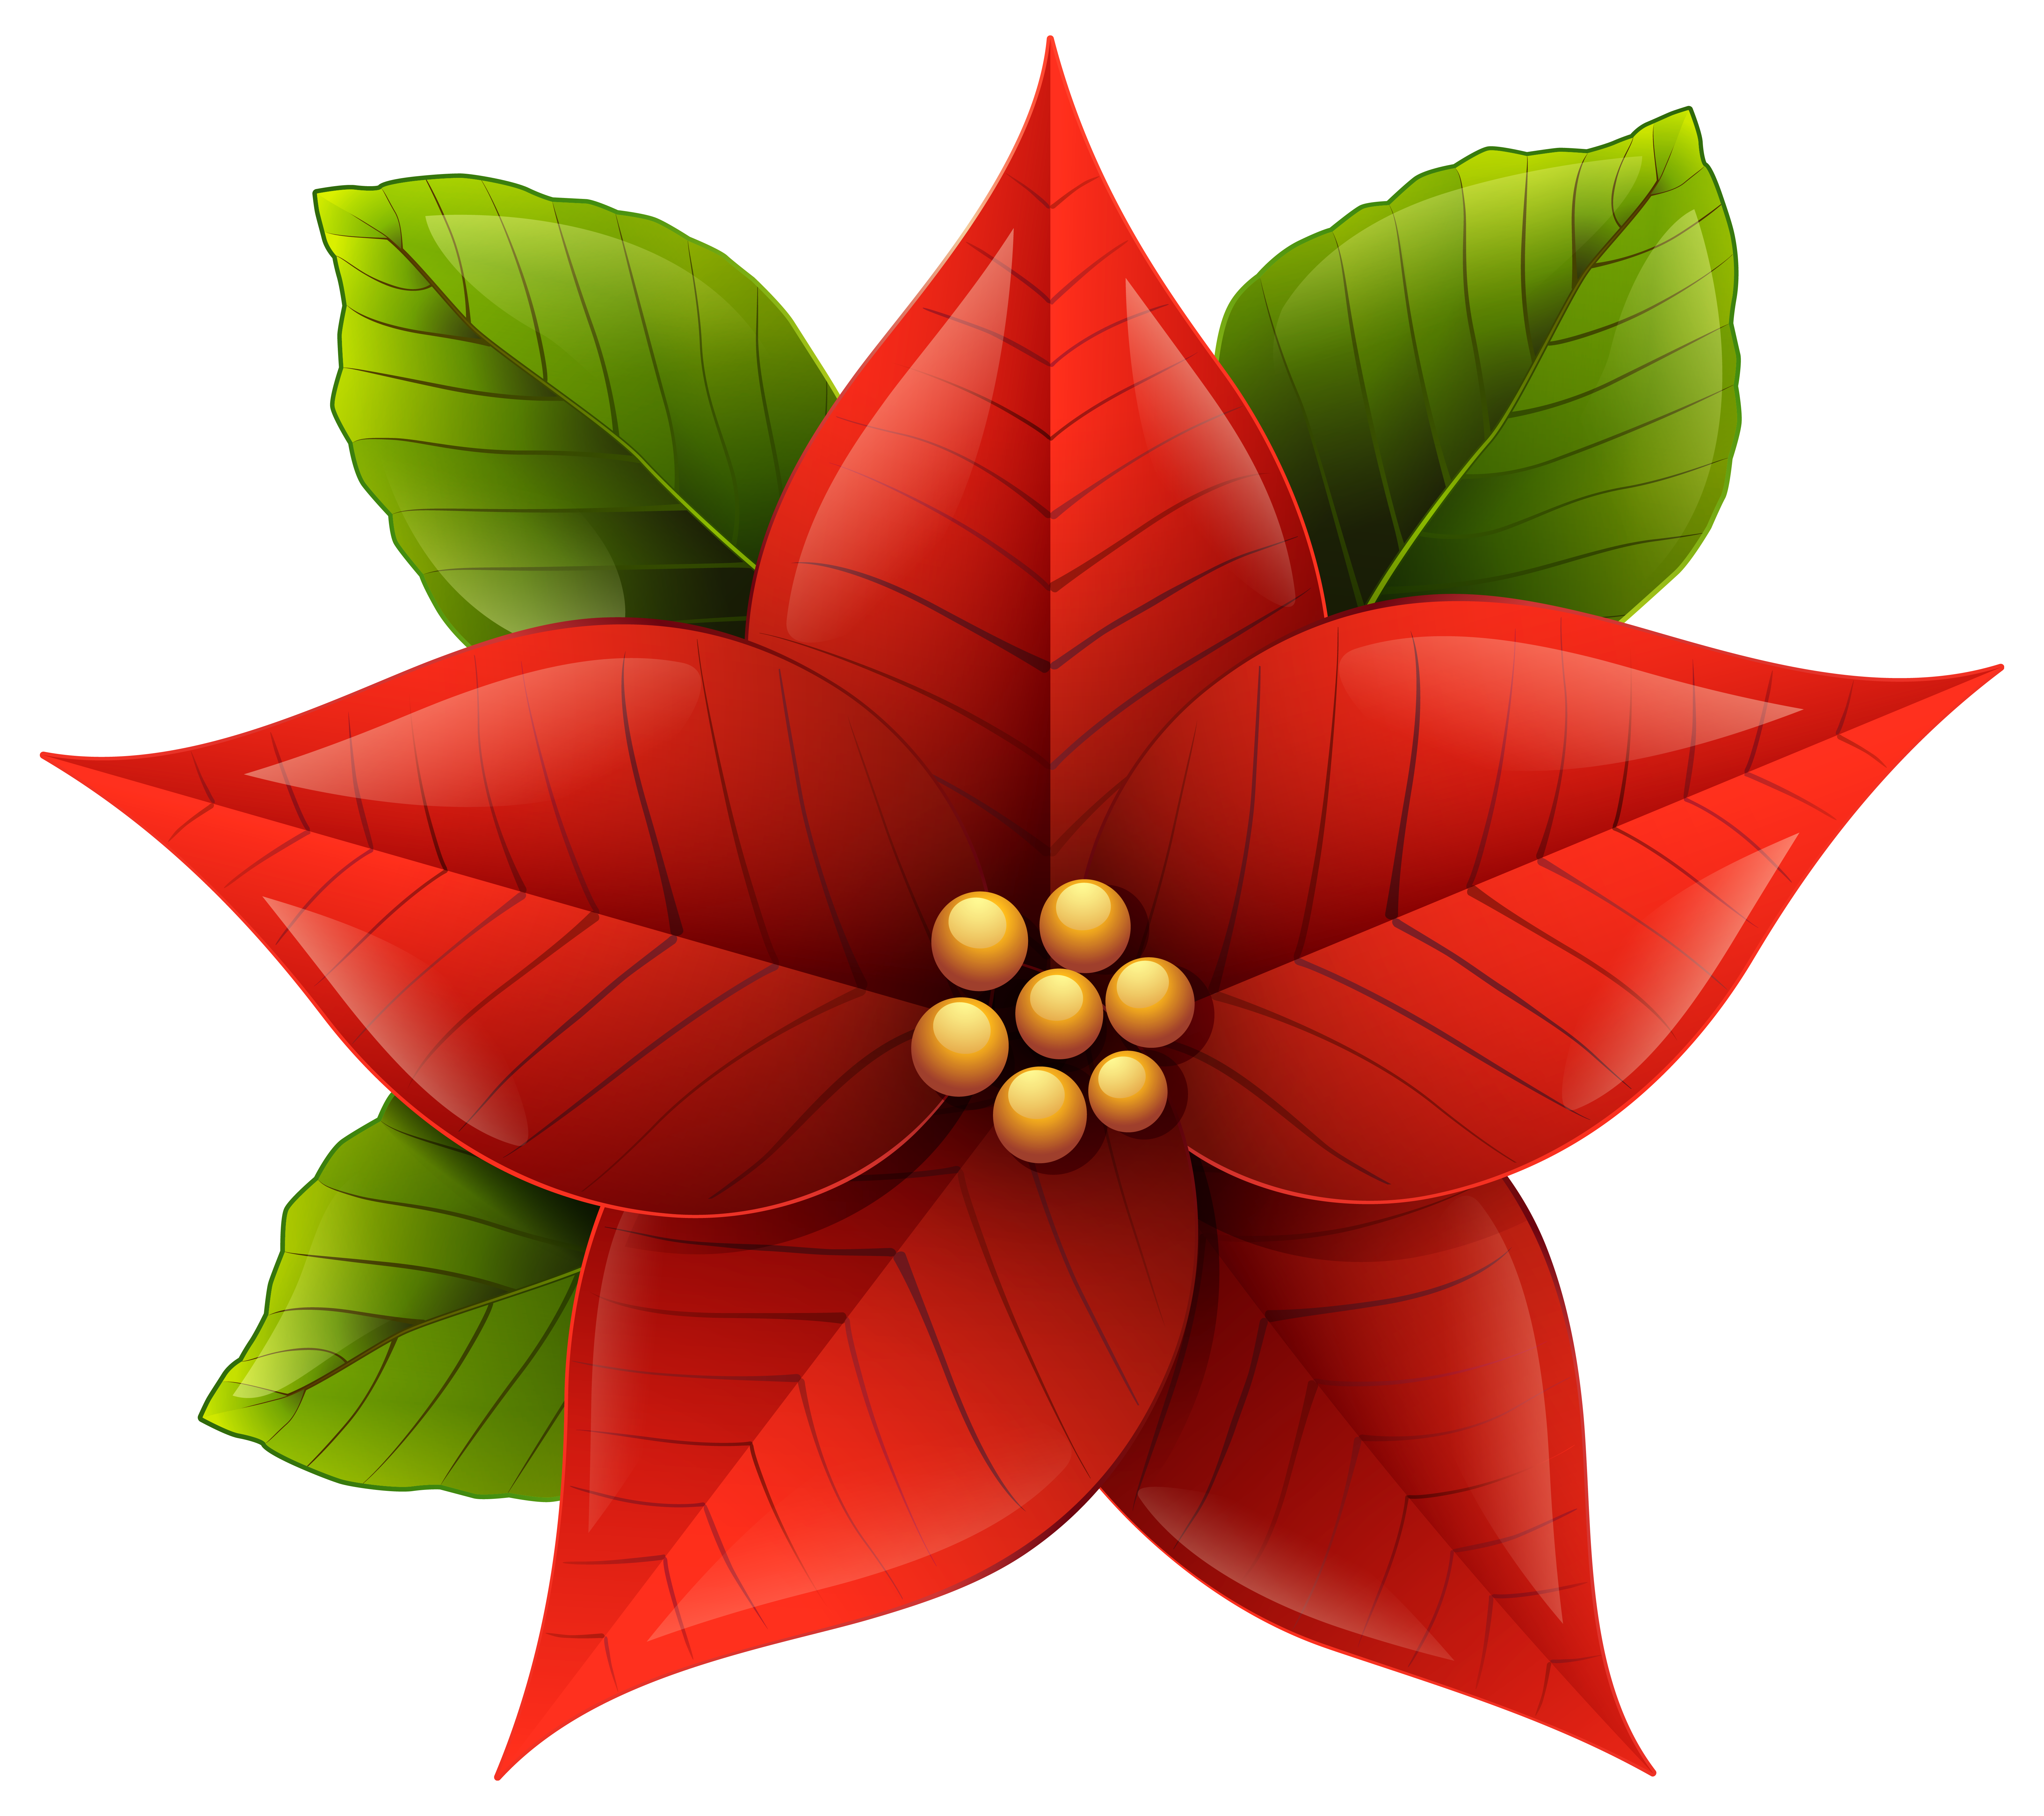 Poinsettia plant clipart image free stock Free Poinsettia Flower Cliparts, Download Free Clip Art ... image free stock